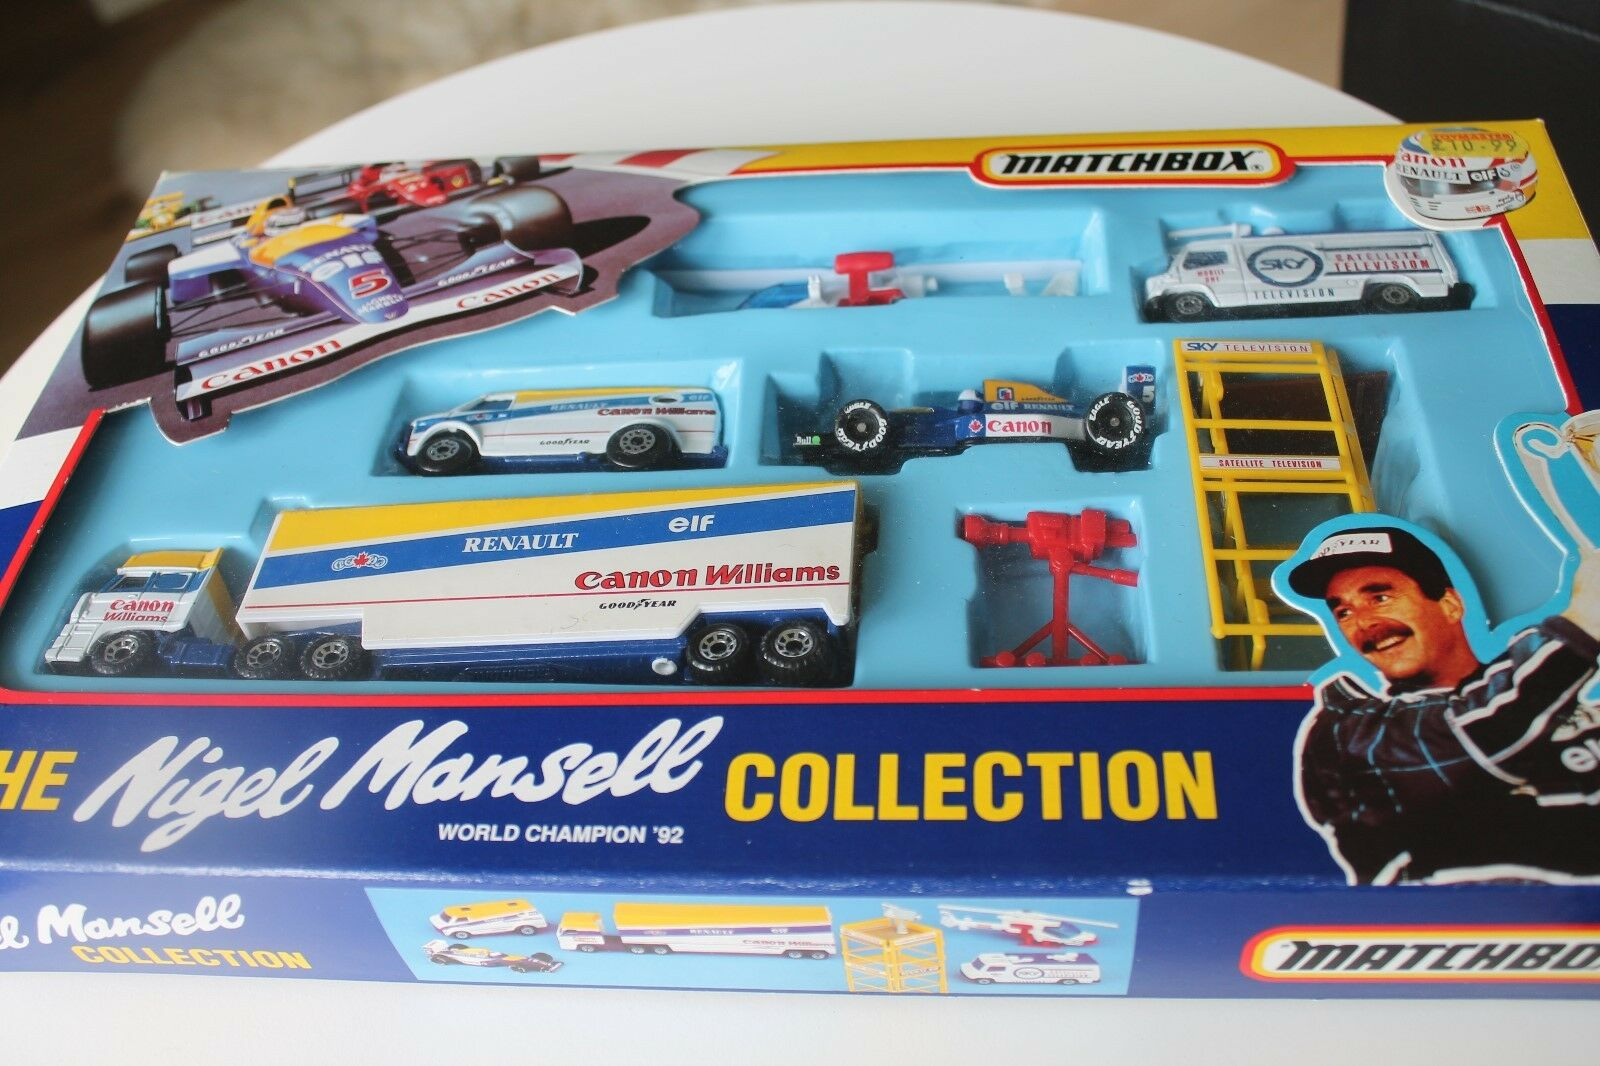 MATCHBOX  THE NIGEL MANSELL COLLECTION  FORMULA 1  1992  SET